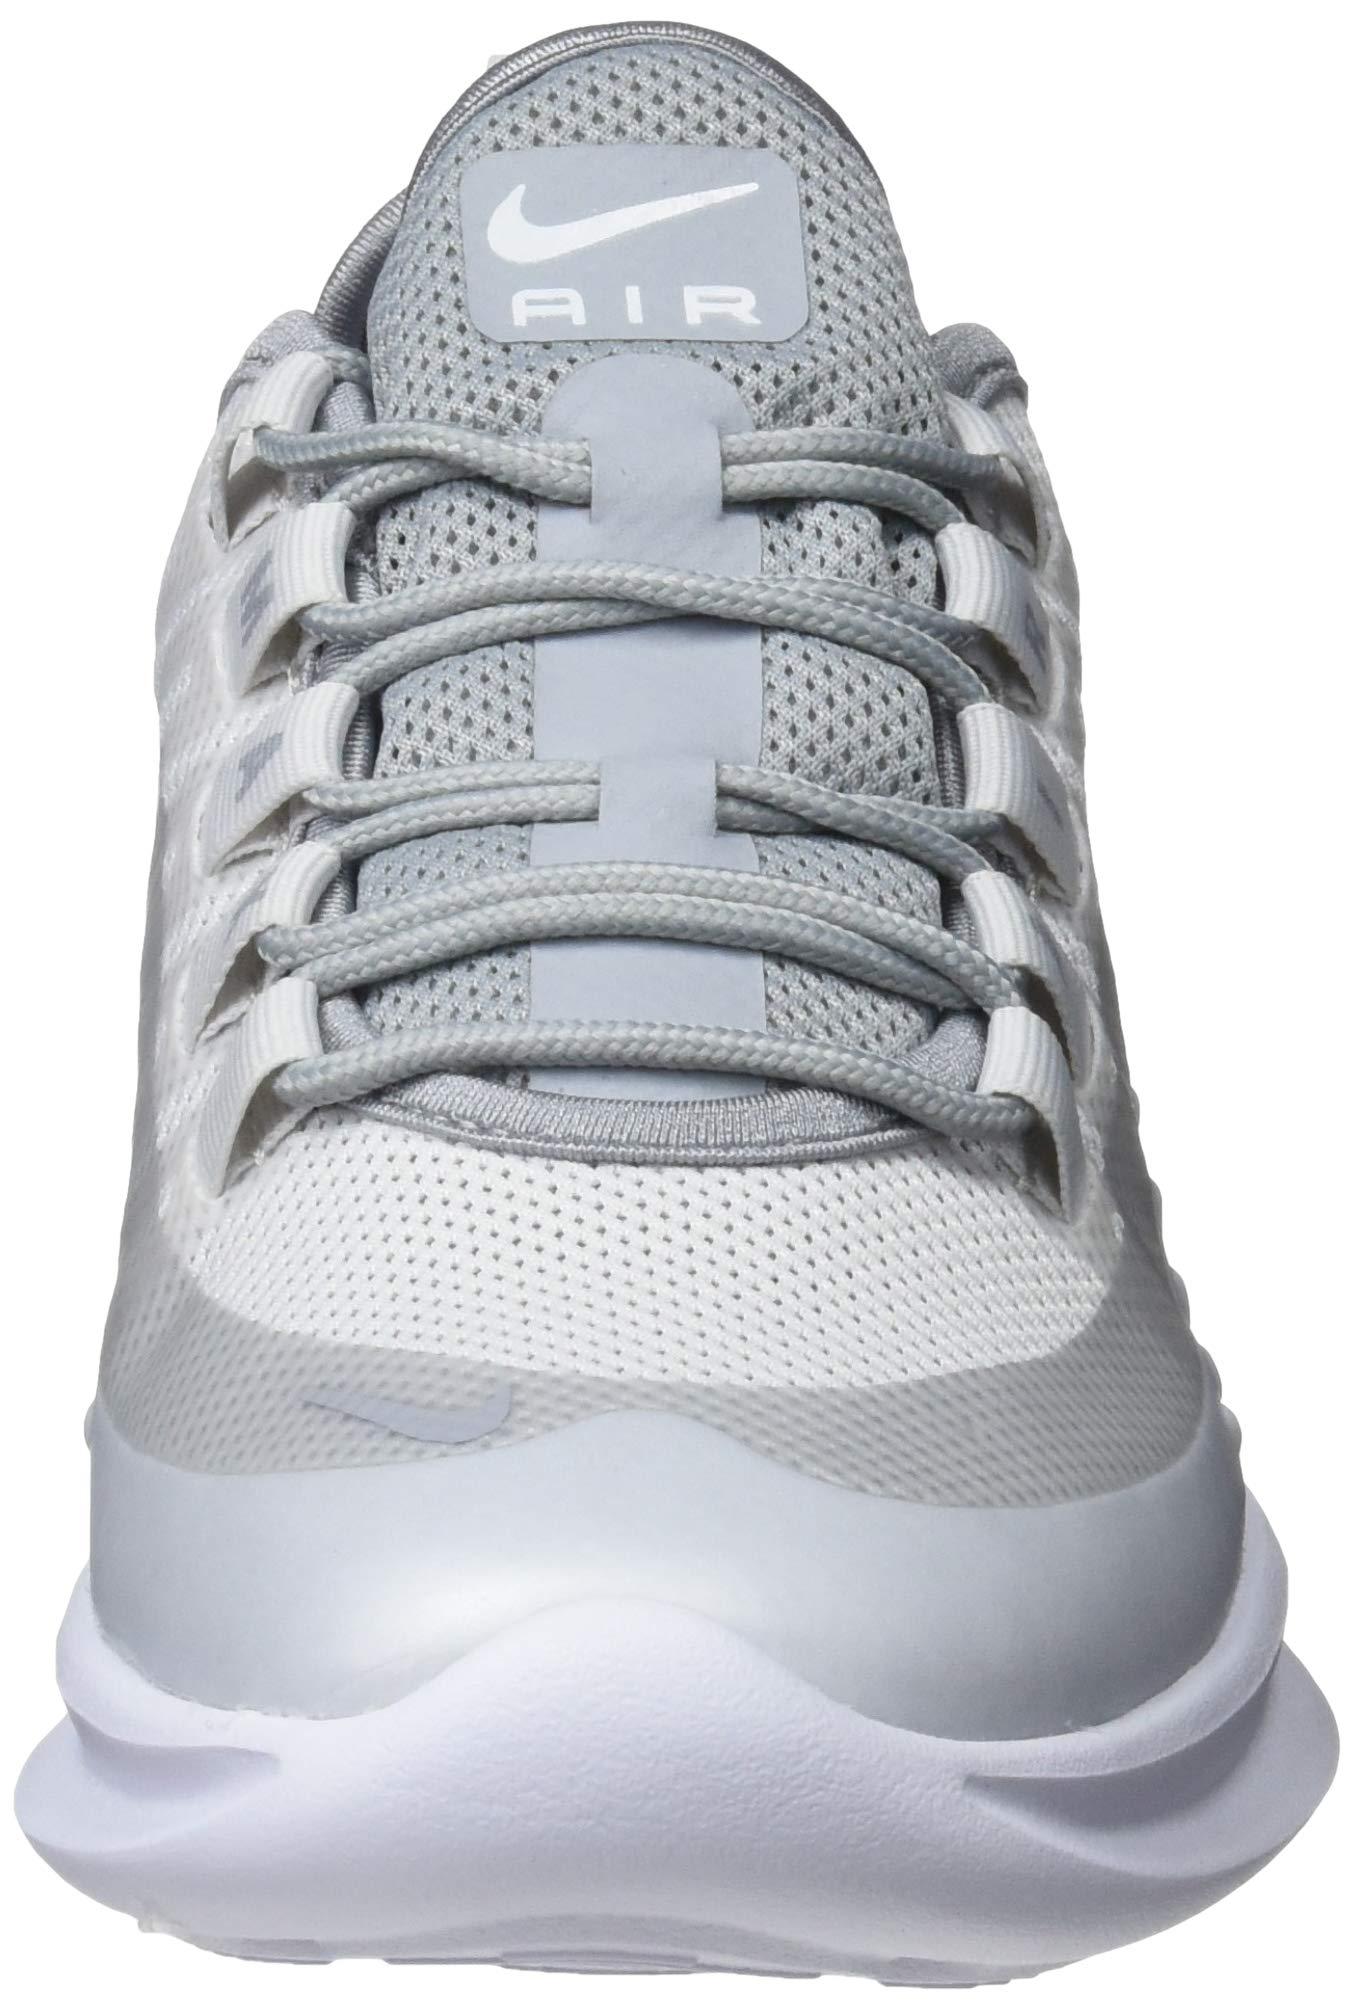 Nike Damen Wmns Air Max Axis Laufschuhe SchwarzWeiß